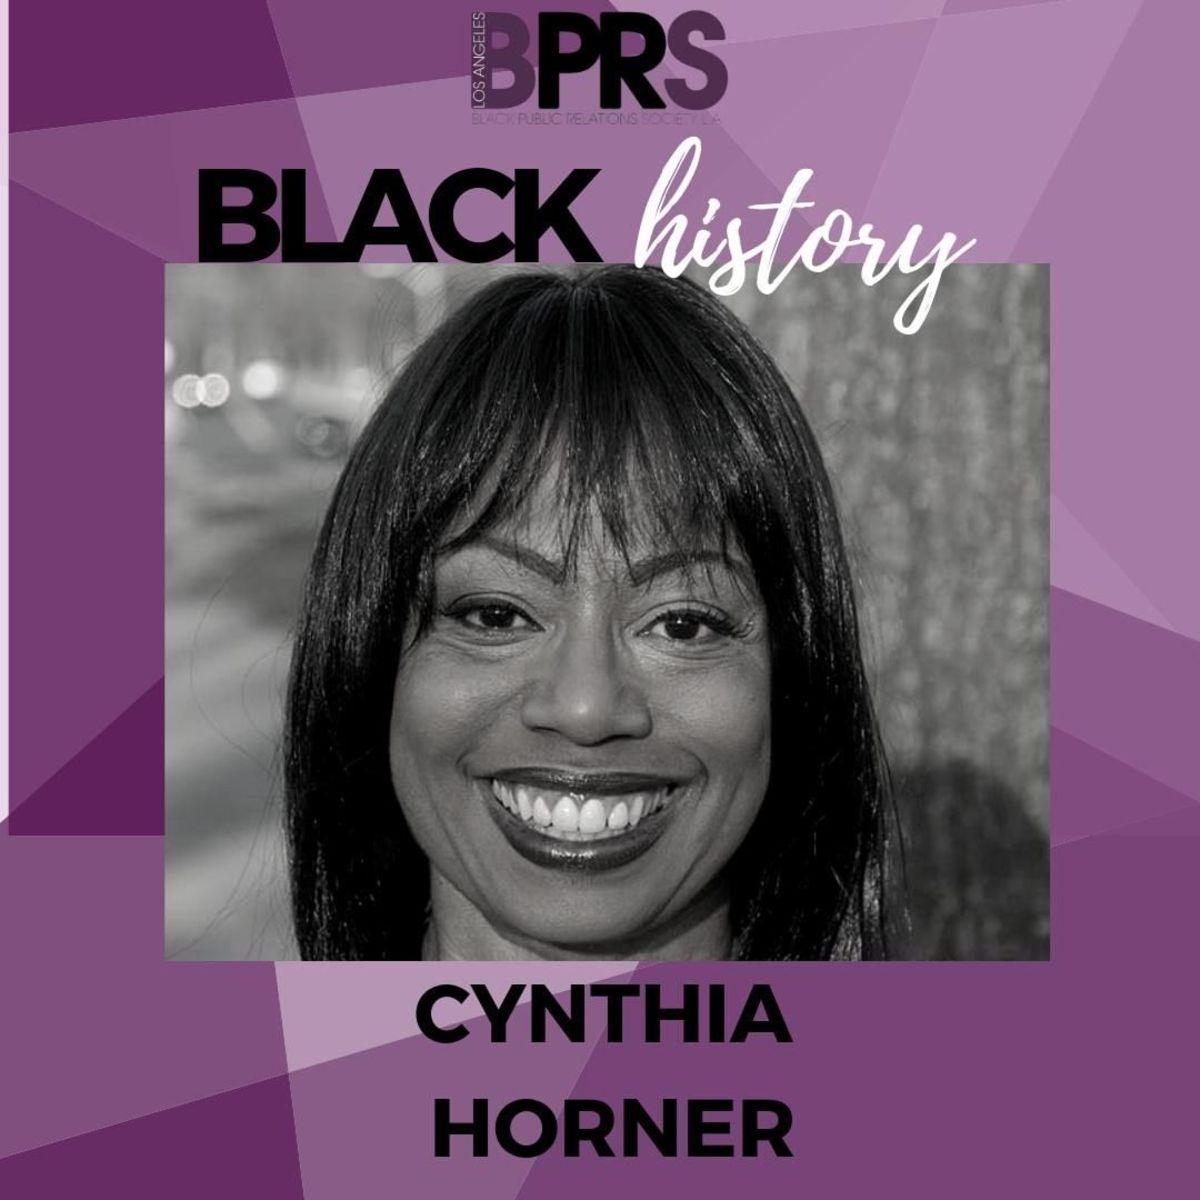 cynthia-horner